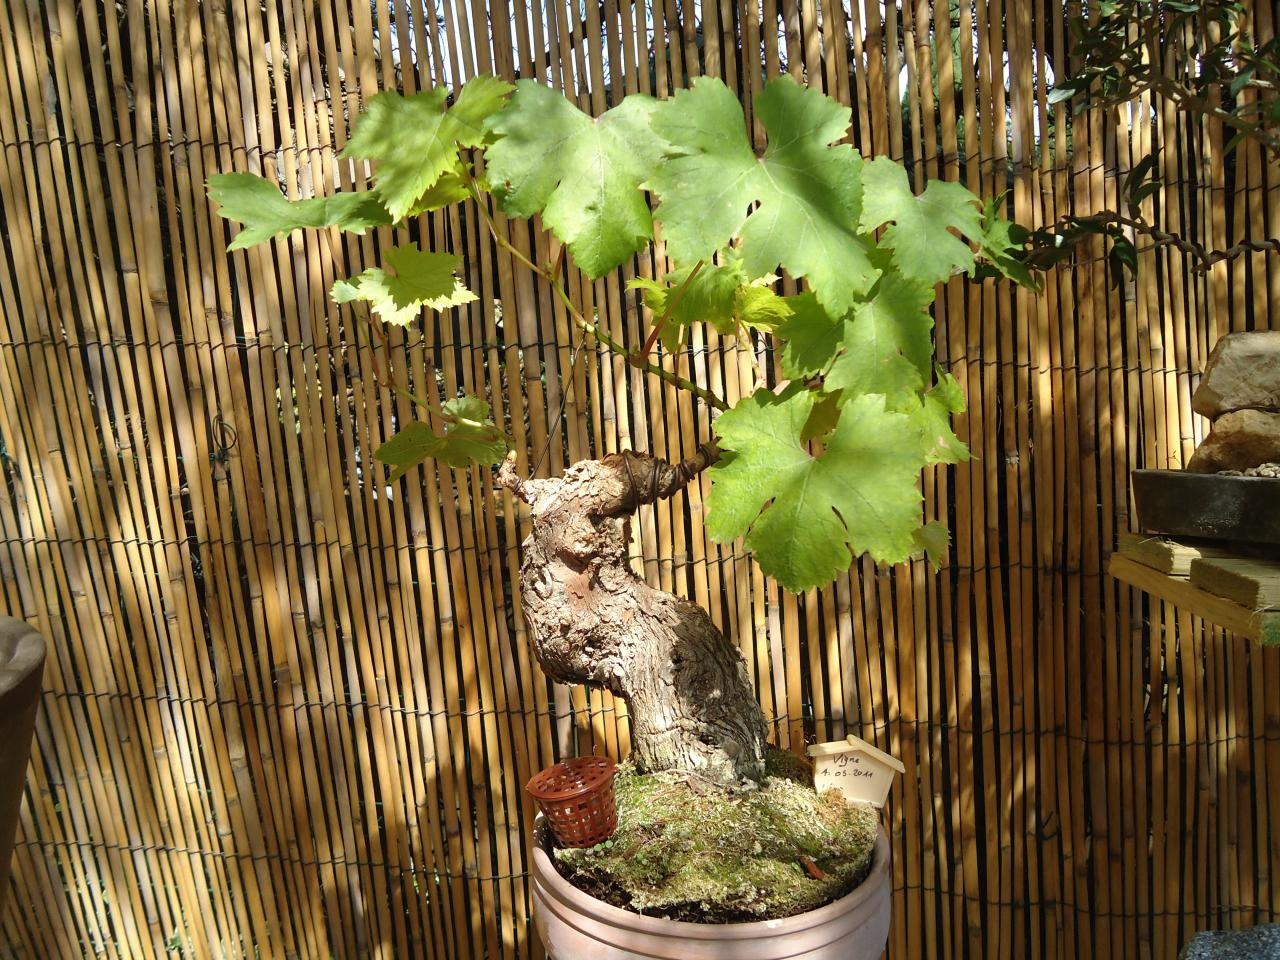 bonsa cr ation fiche d 39 entretien du vigne vitis vinifera. Black Bedroom Furniture Sets. Home Design Ideas